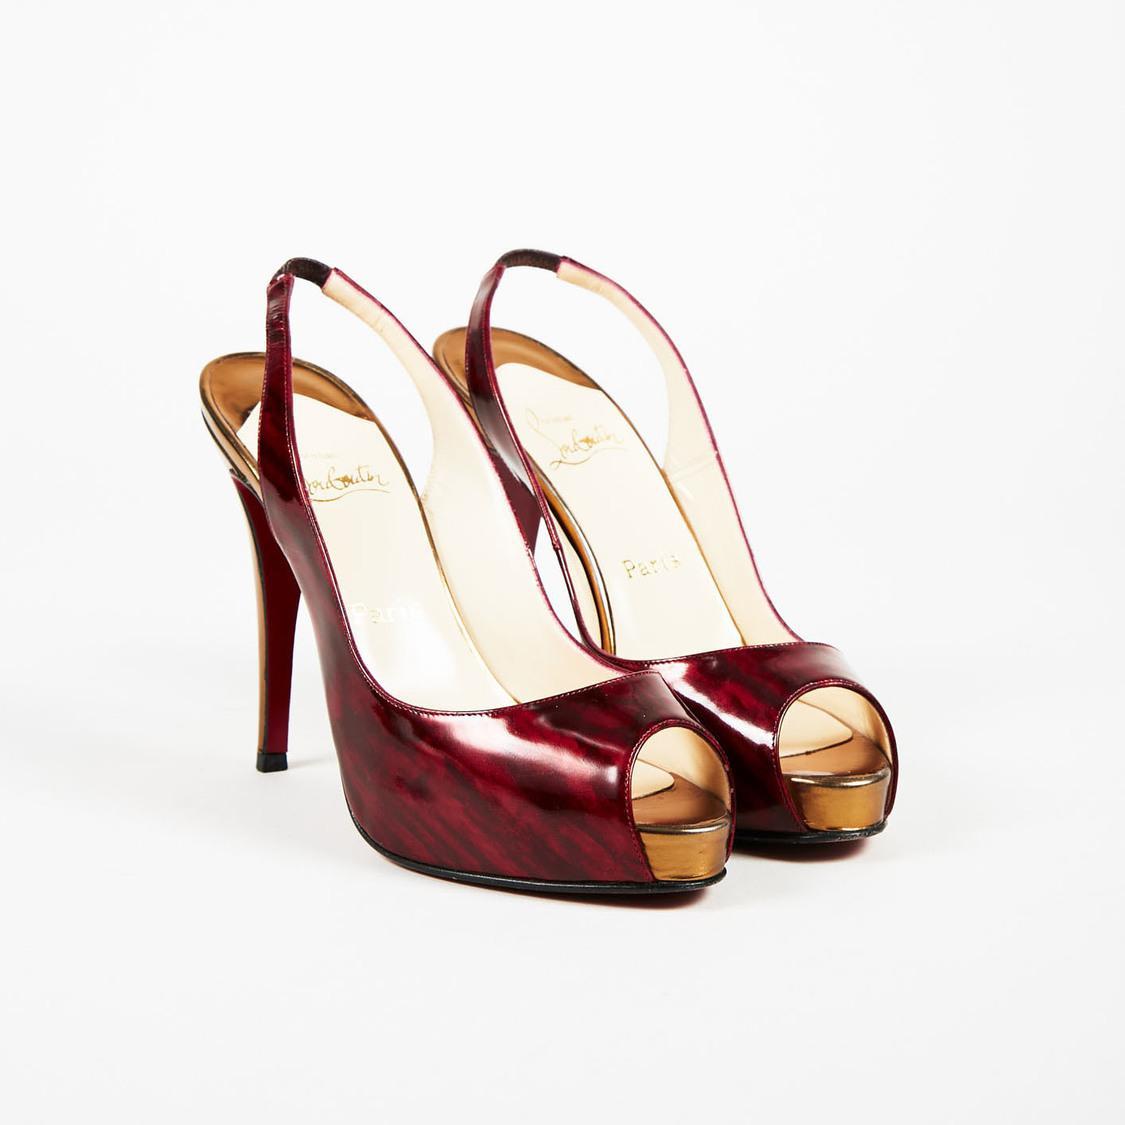 3b6e9ae4b5c Christian Louboutin. Women s Red Slingback Patent Leather Platform Pumps